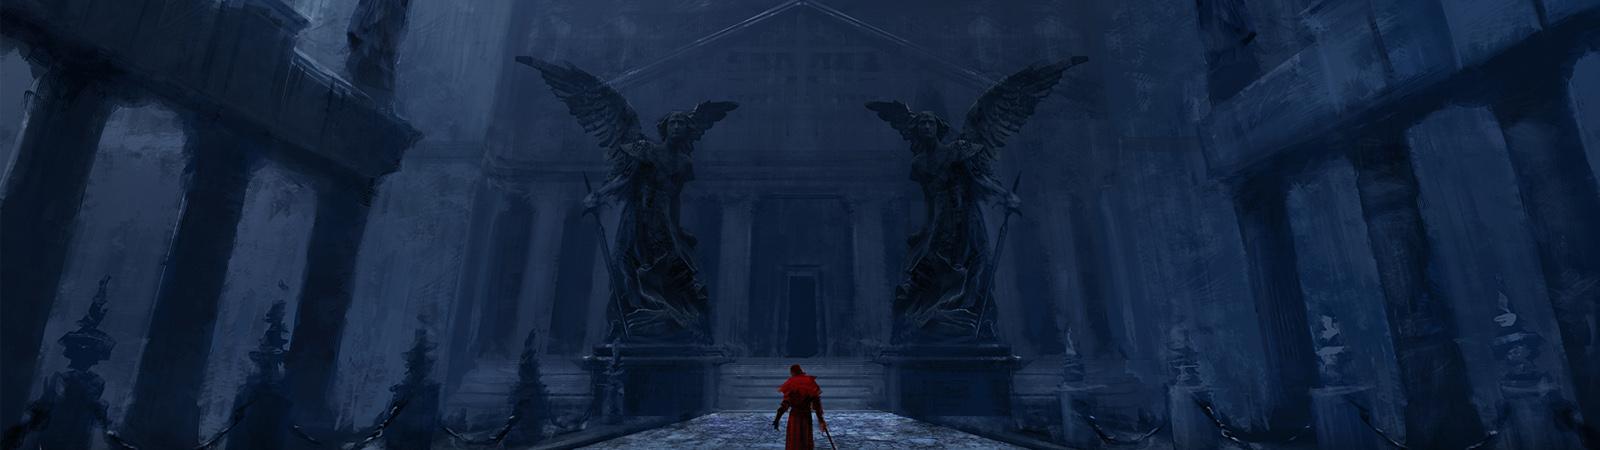 ESNE Castlevania MercurySteam Monsters Pit